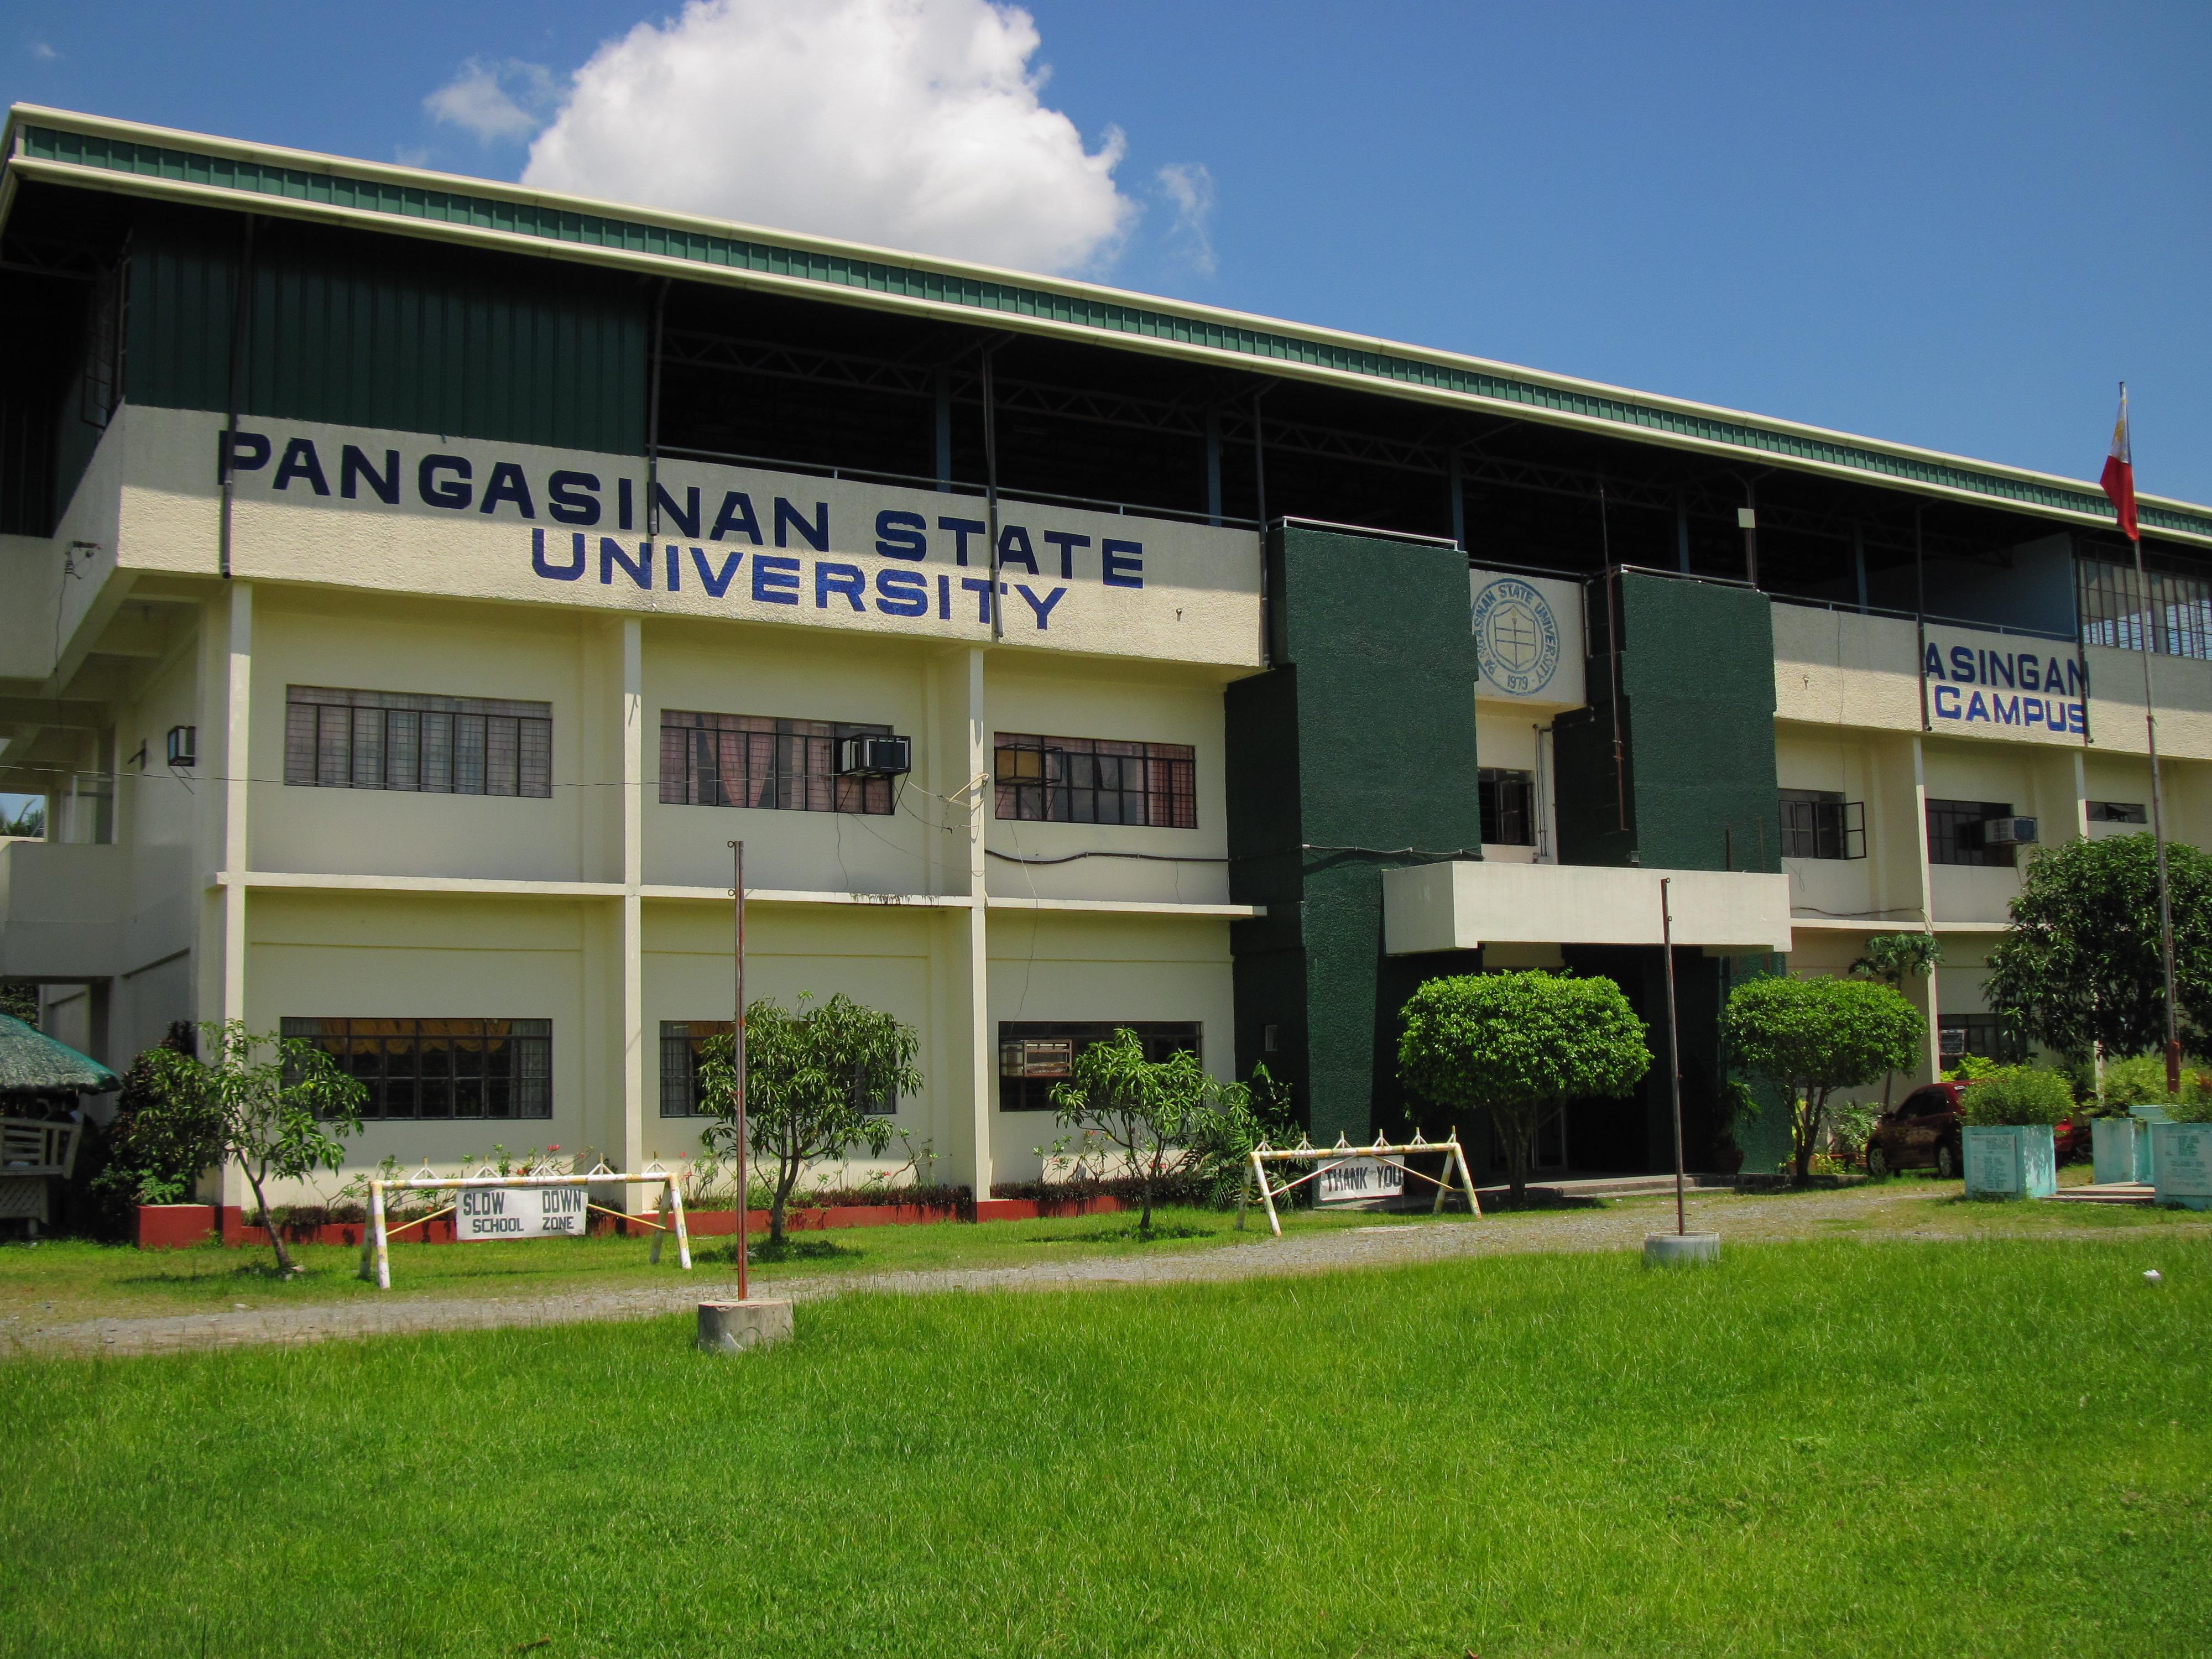 filepangasinan state university asingan campusjpg